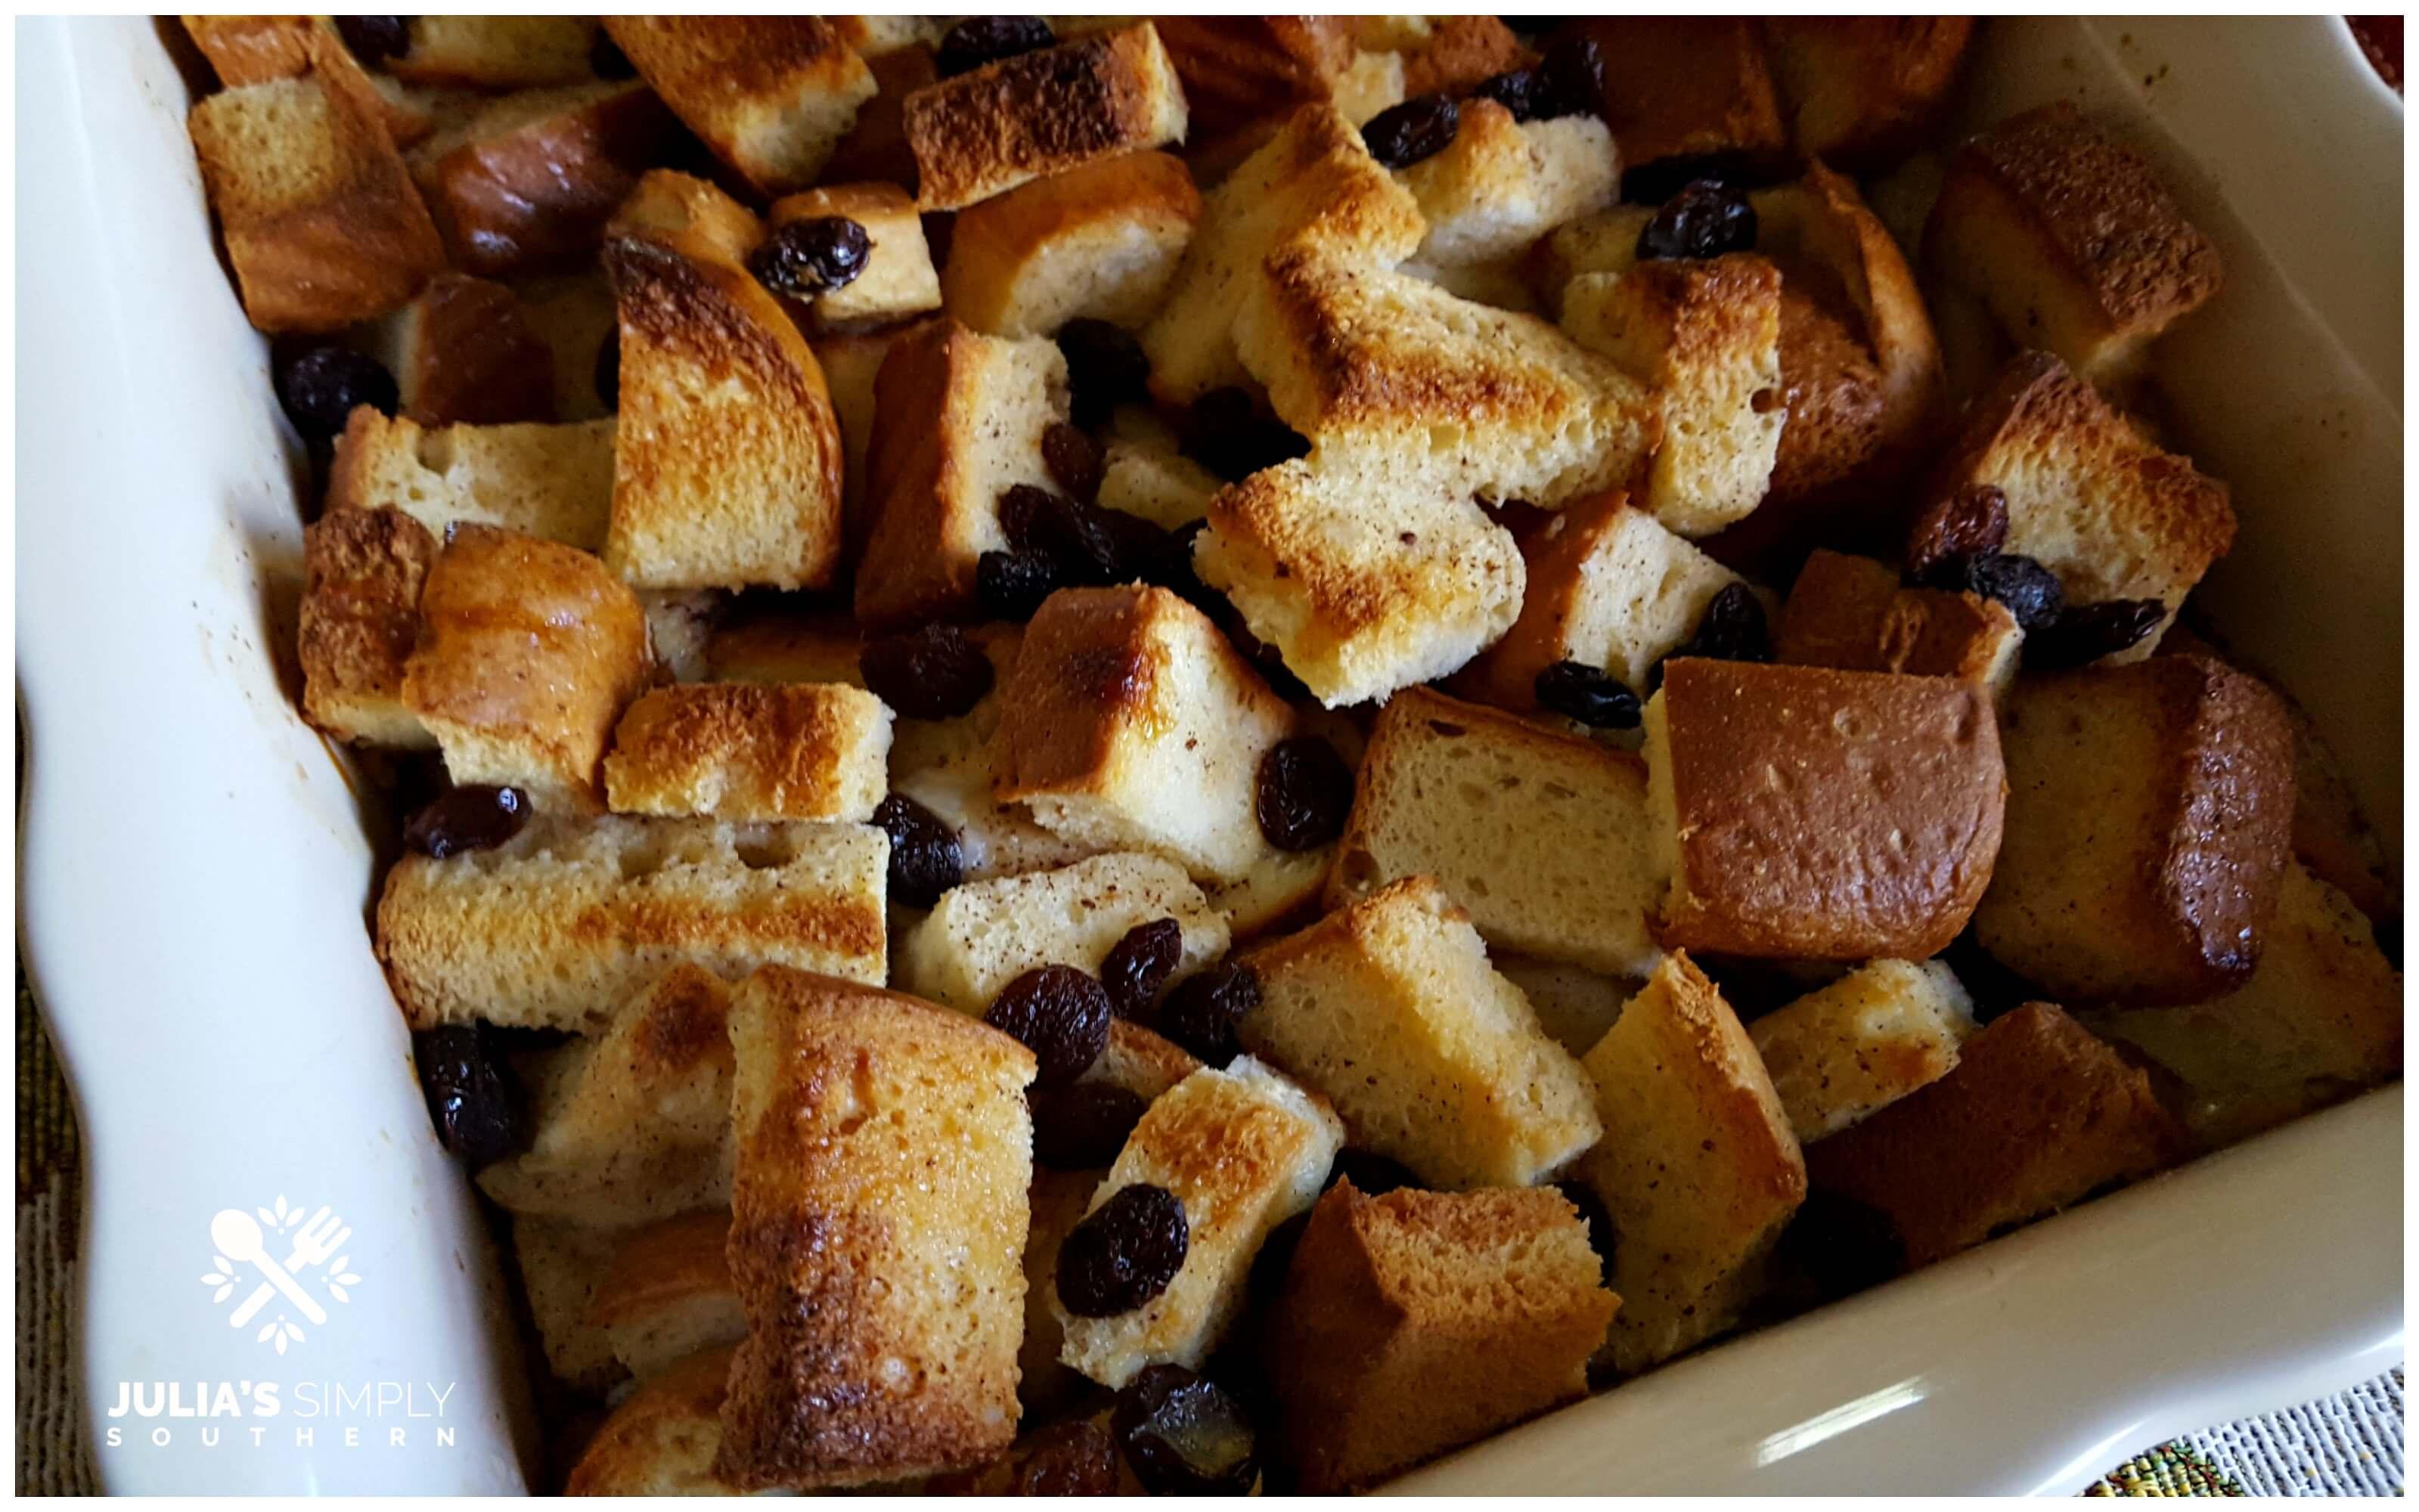 Classic Bread pudding dessert - comfort food - in a casserole dish